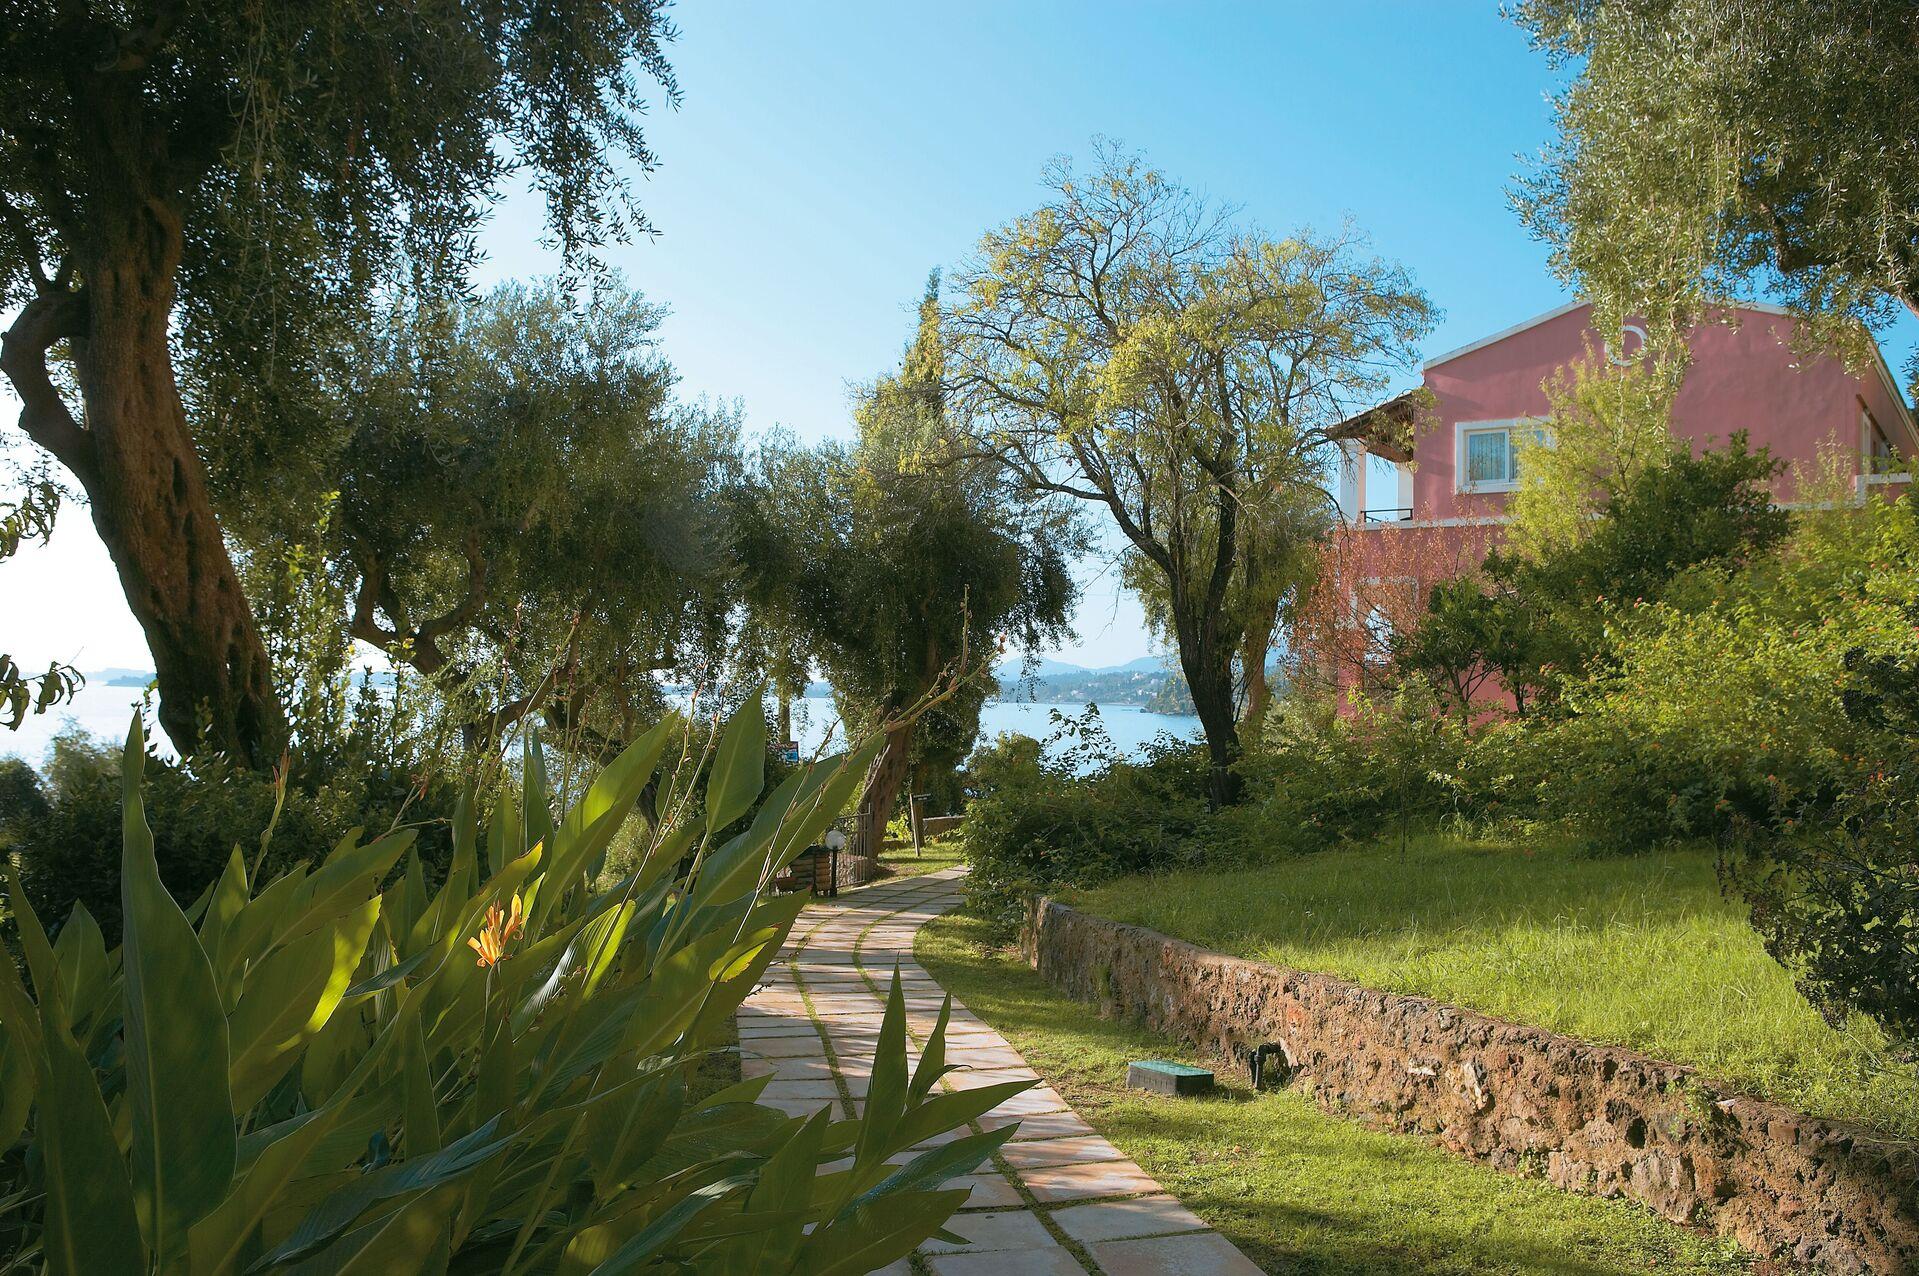 https://cms.satur.sk/data/imgs/tour_image/orig/26-luxury-accommodation-among-lush-corfiot-gardens_72dpi-1946659.jpg